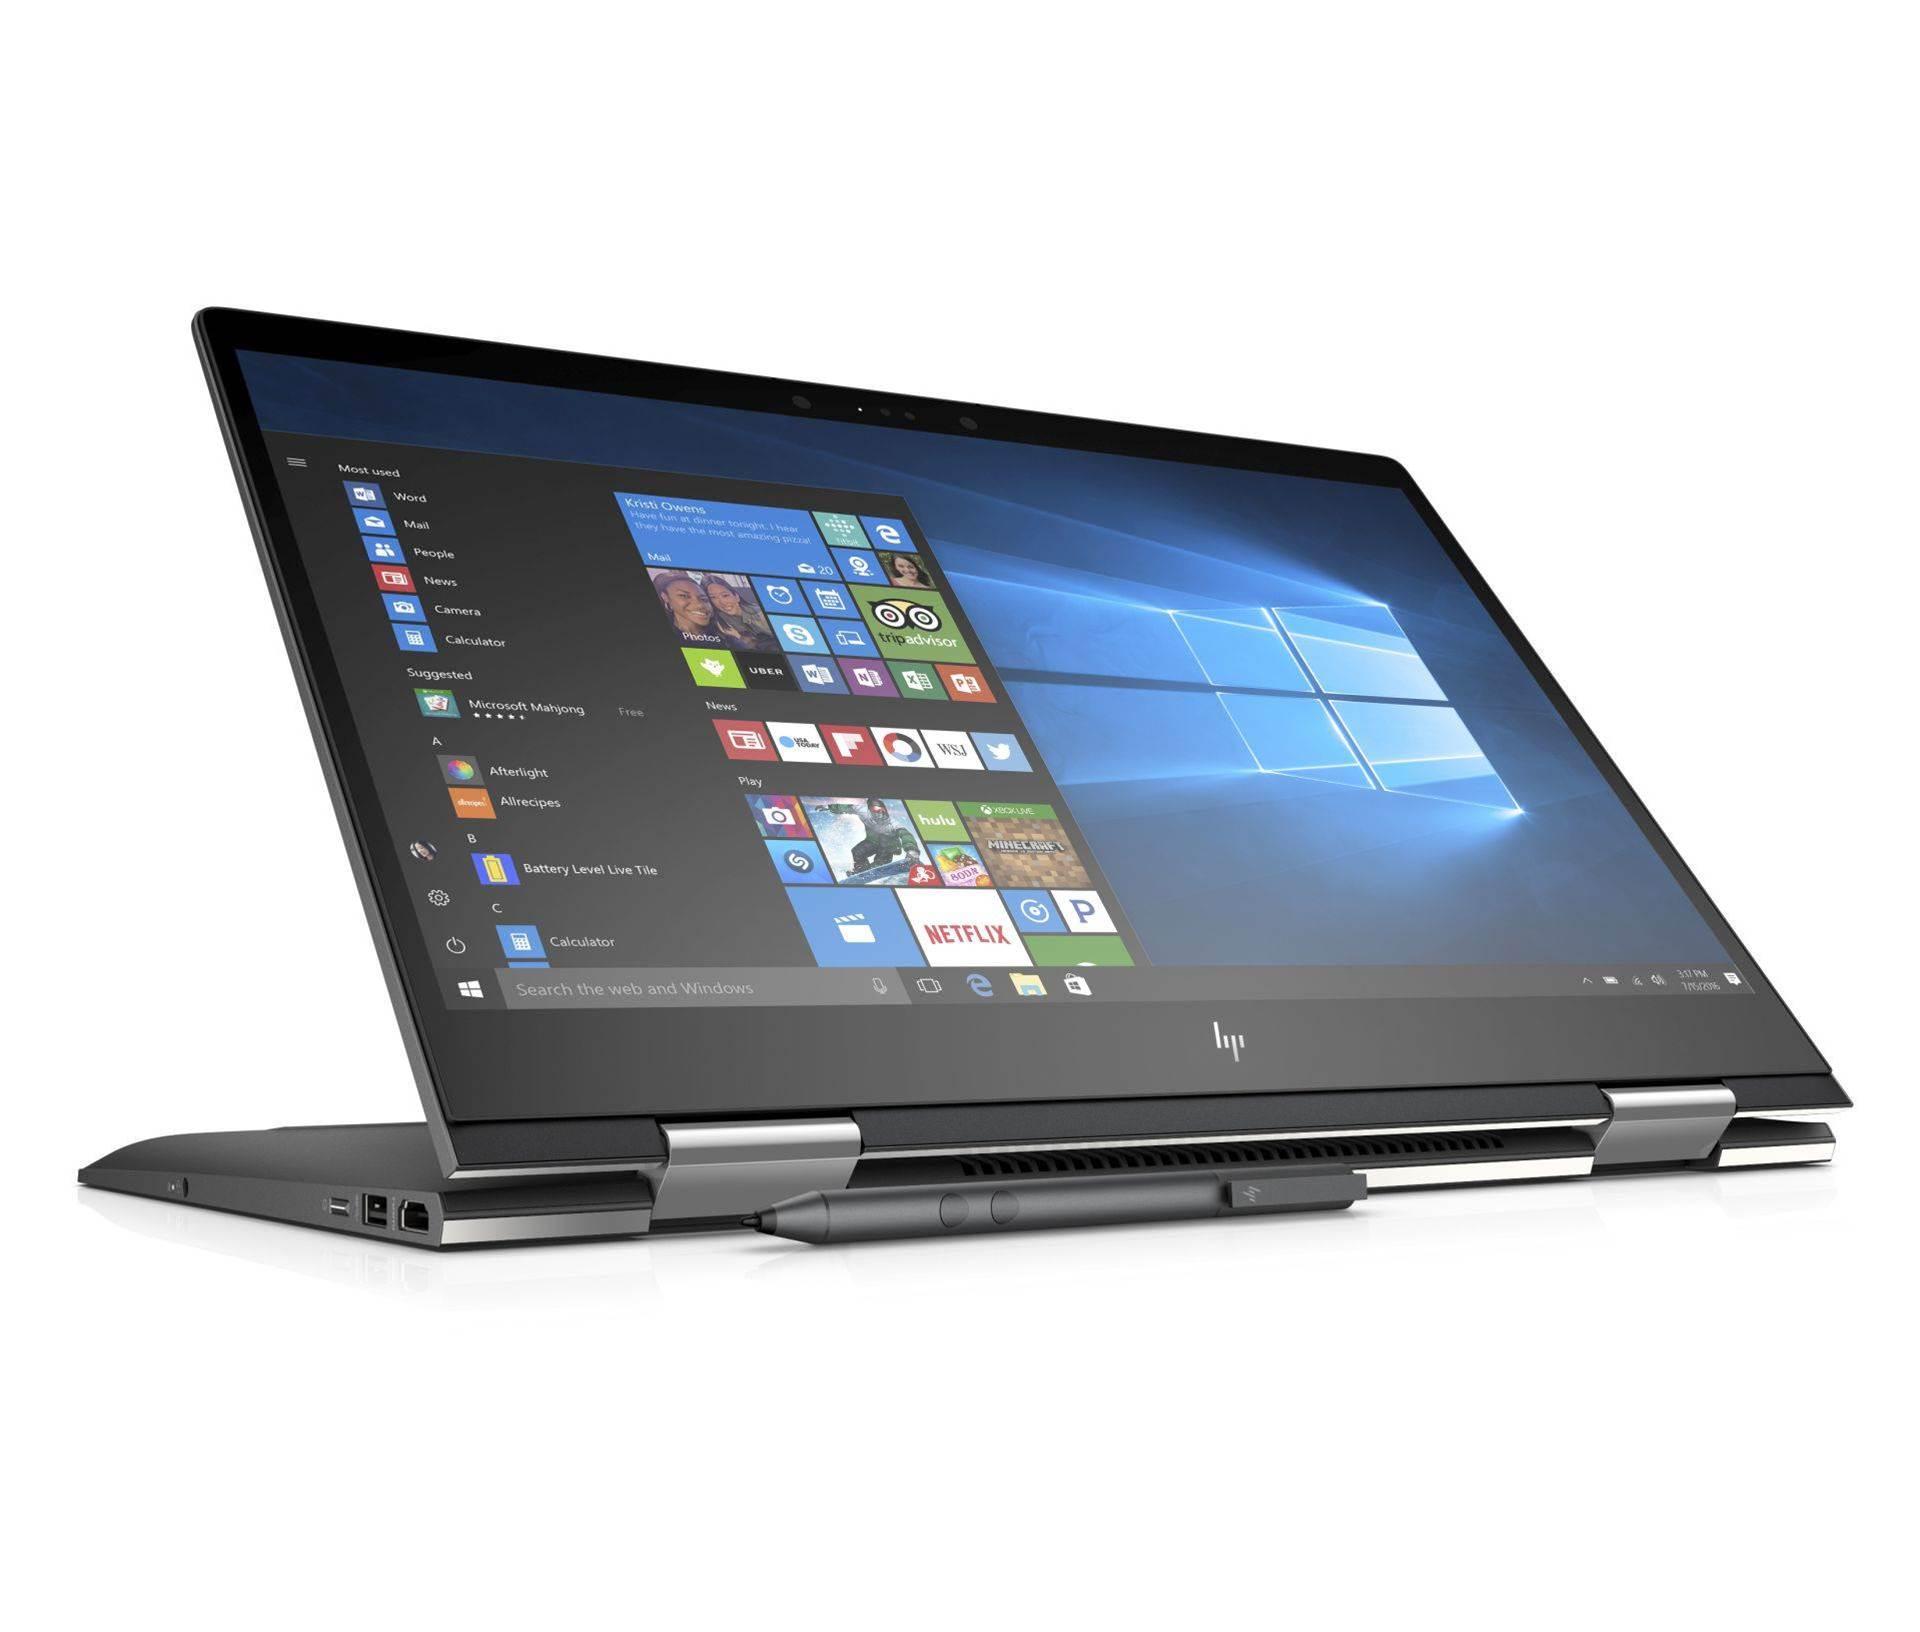 Review: HP Envy X360 15-BQ100AU 15.6in 2-in-1 Laptop